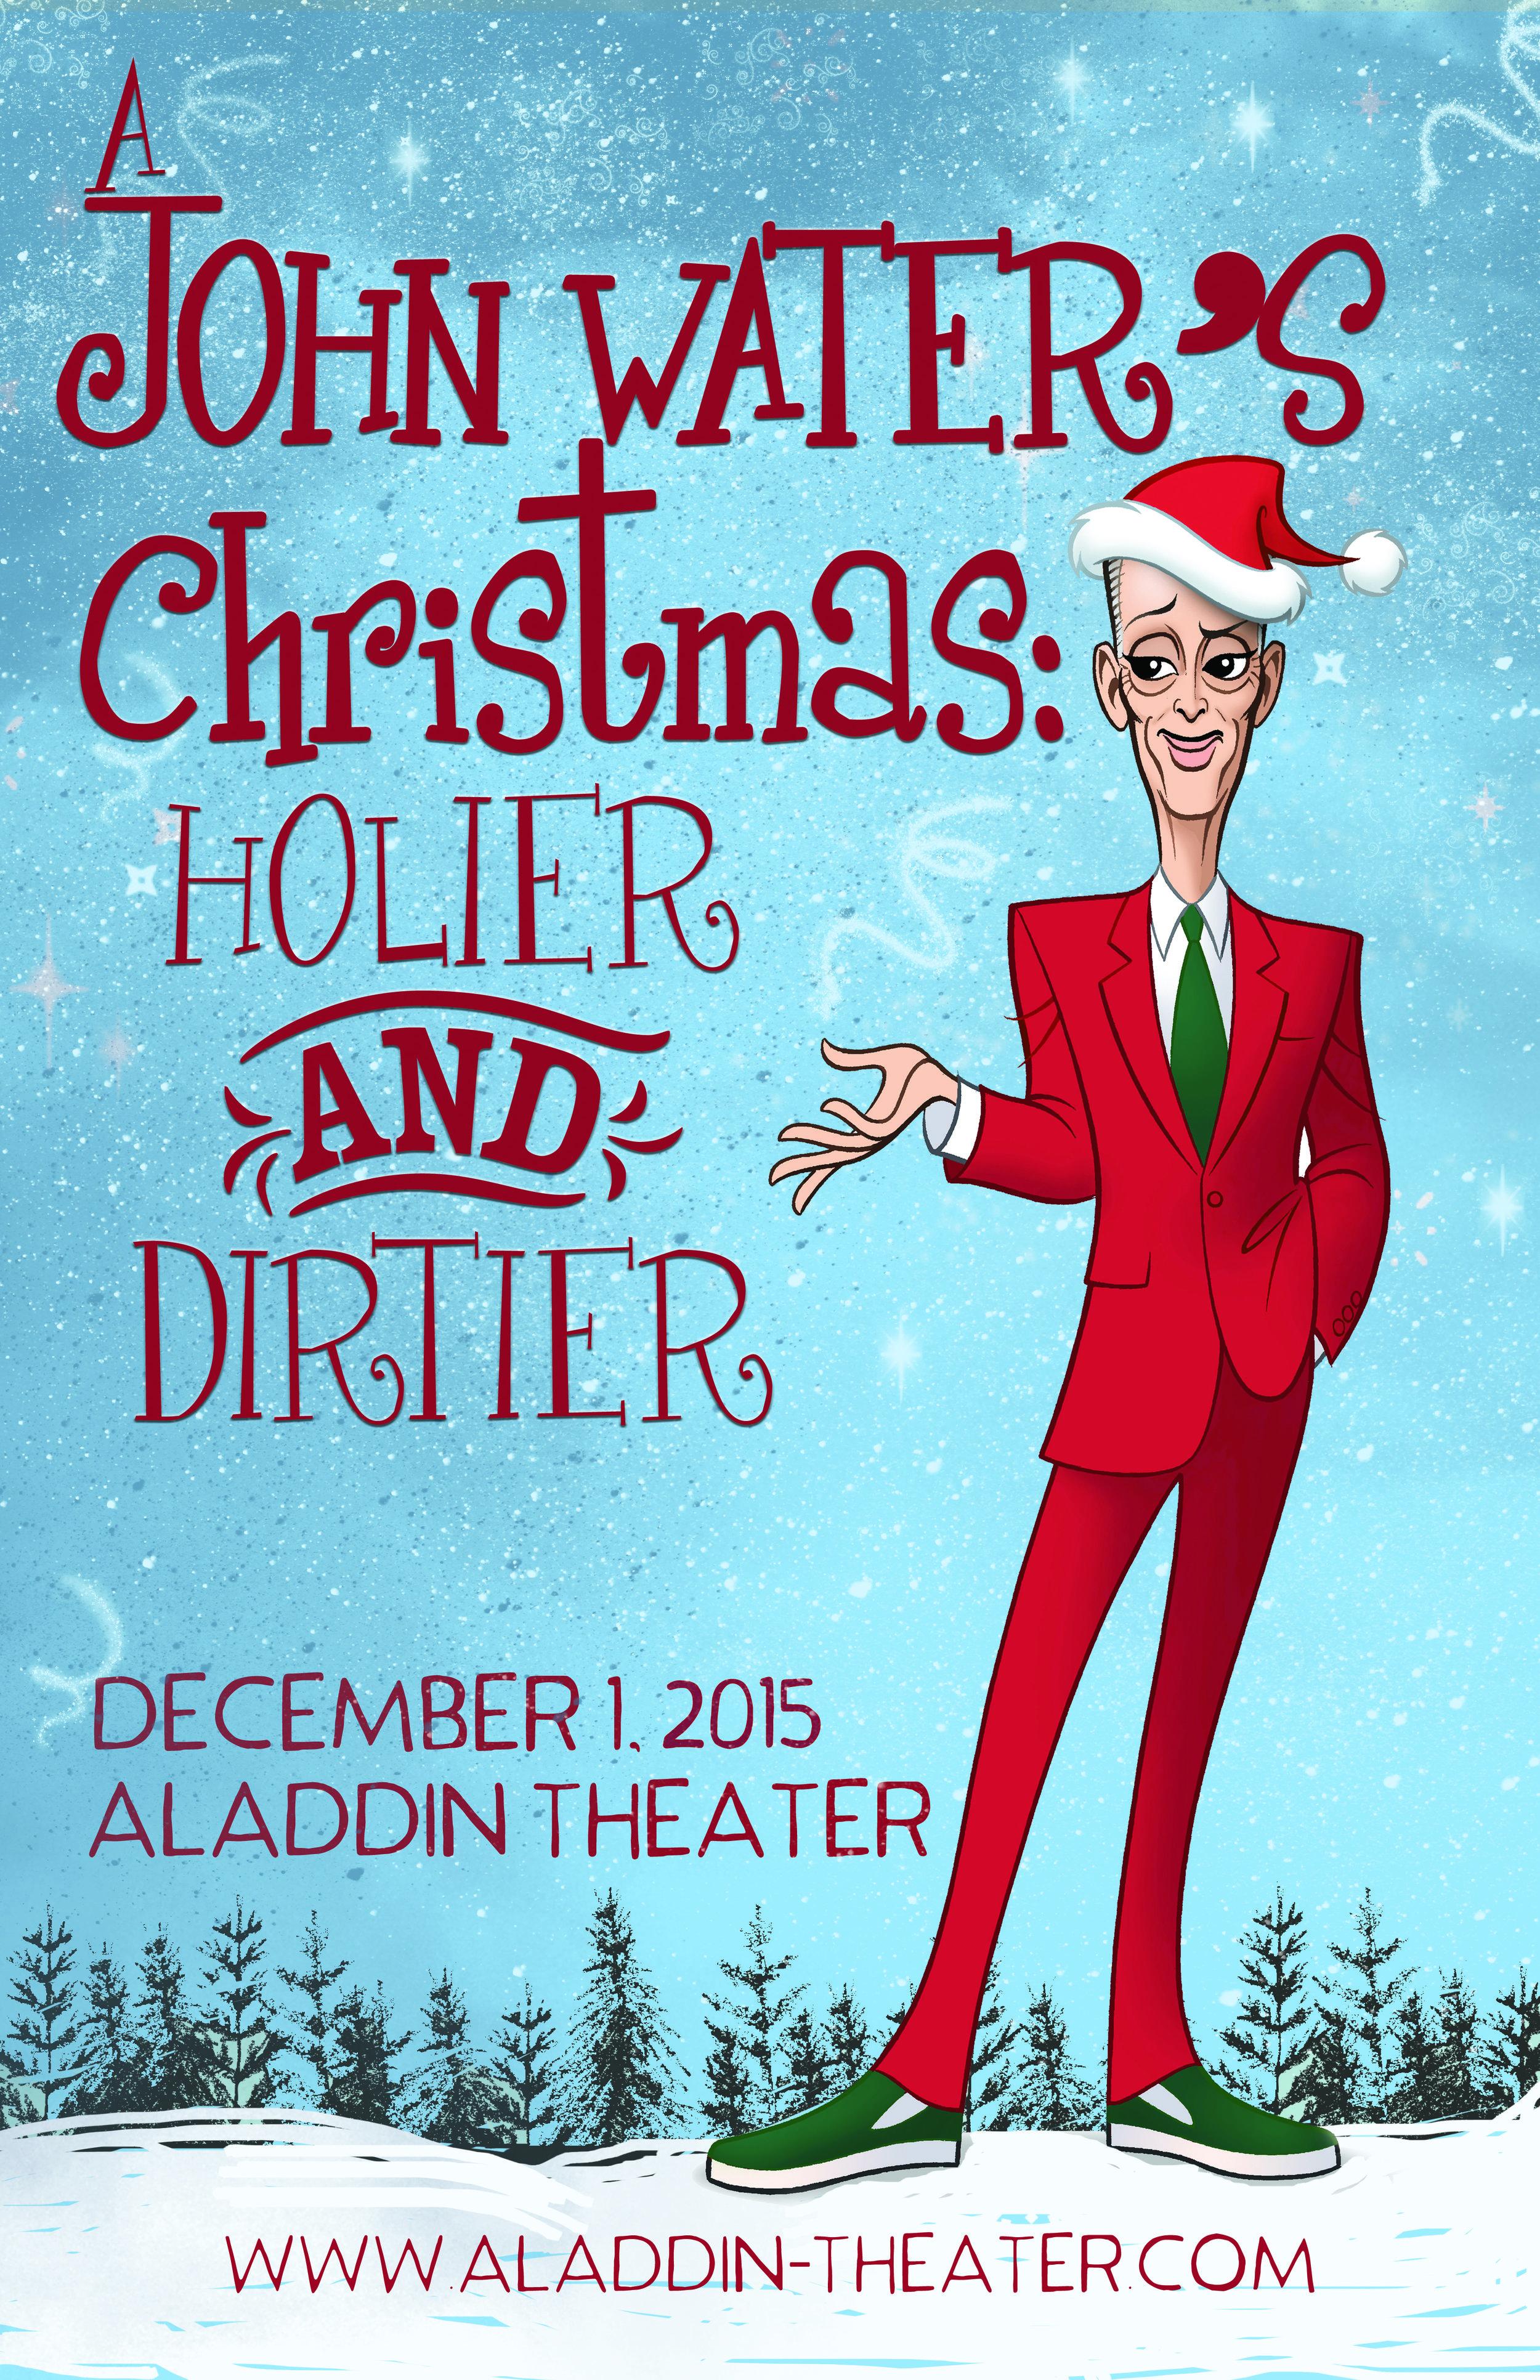 John Waters Christmas Poster.jpg